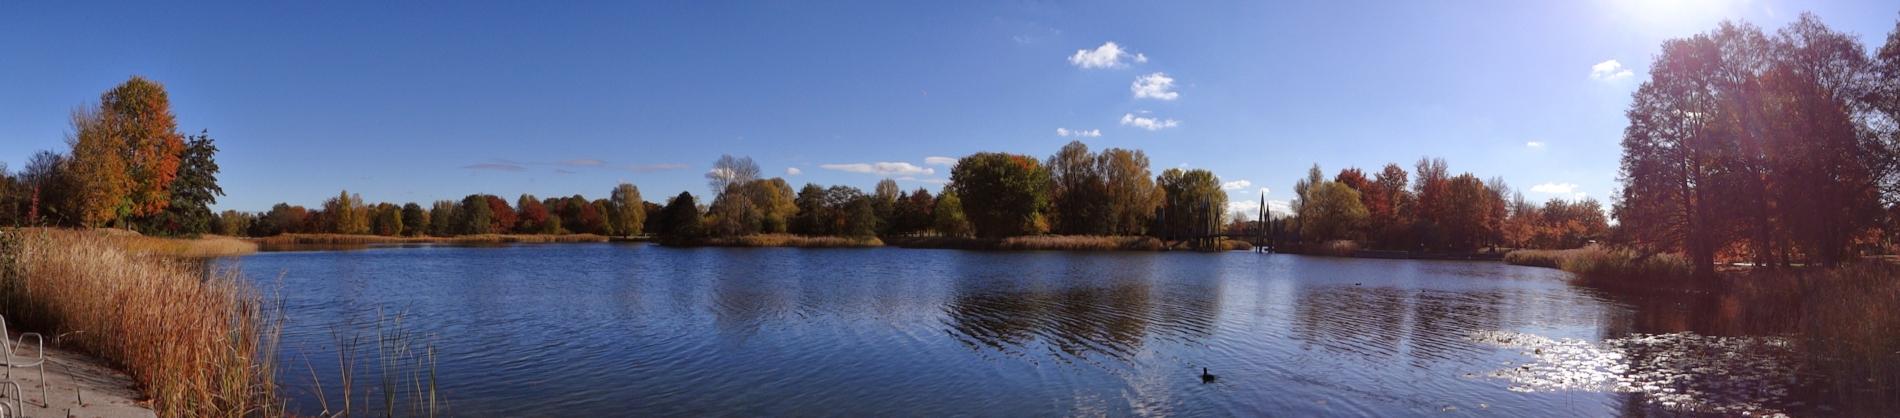 Britzer Garten Panorama 7